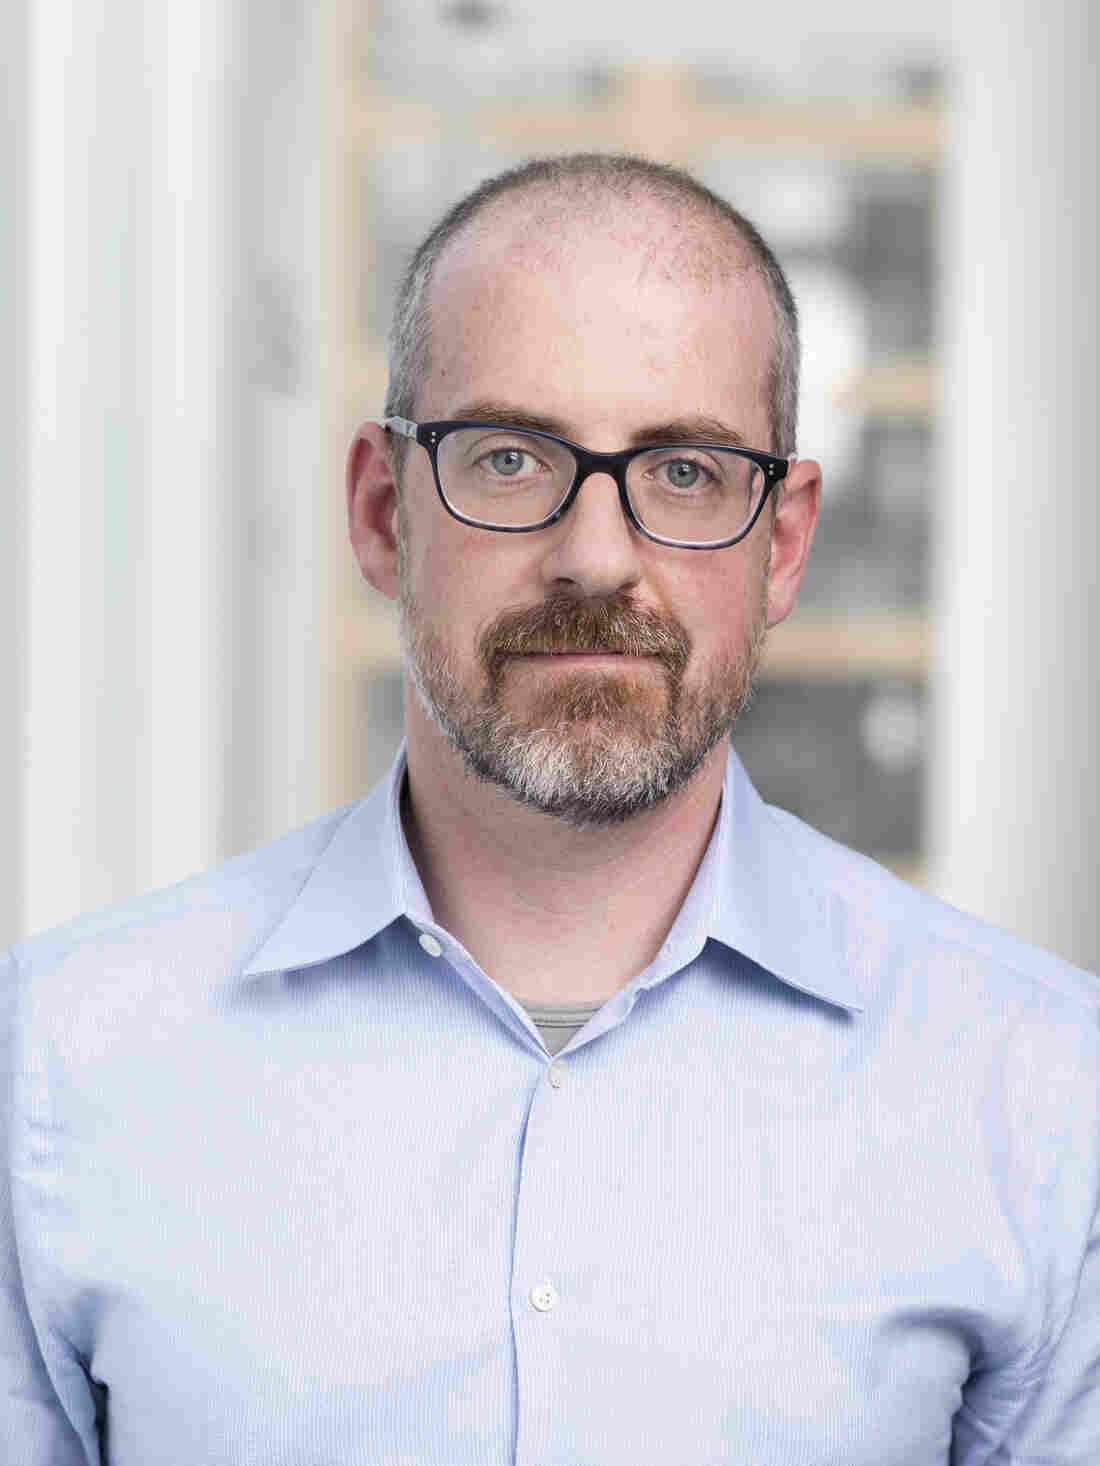 Geoff Brumfiel, photographed for NPR, 17 January 2019, in Washington DC.